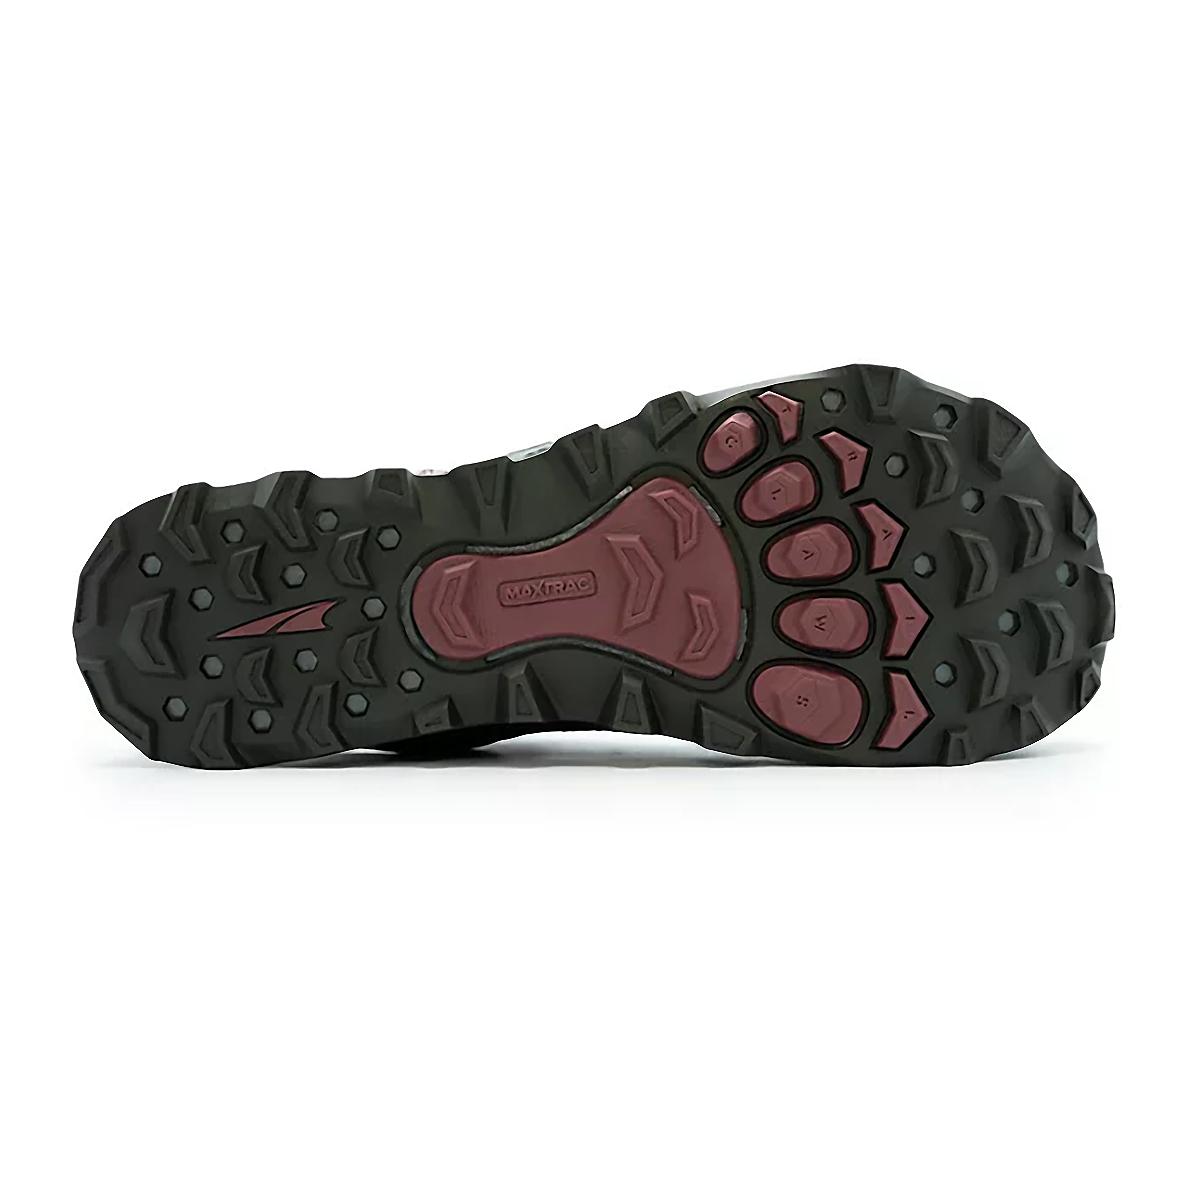 Women's Altra Lone Peak 4.5 Low Trail Running Shoe - Color: Dark Port - Size: 5.5 - Width: Regular, Dark Port, large, image 4